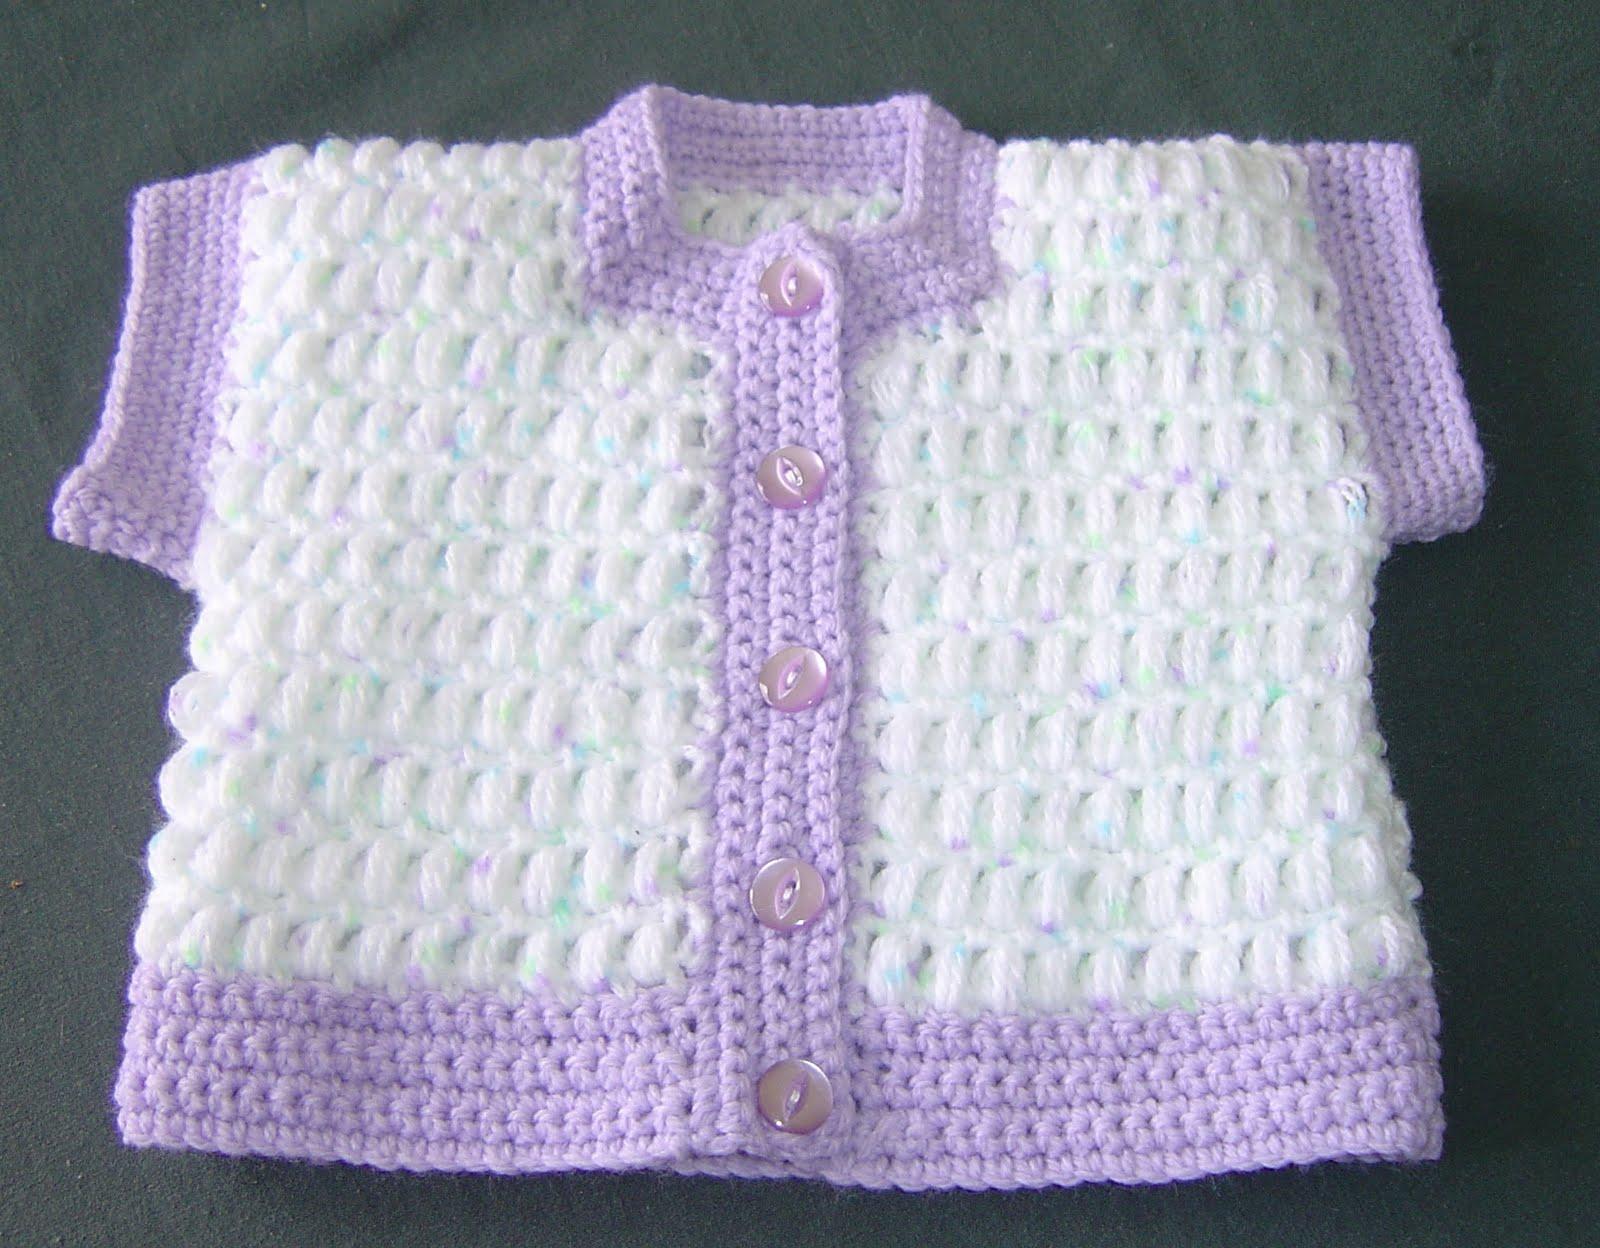 Crochet Baby Waistcoat Pattern : Enthusiastic crochetoholic: Crochet Baby Waistcoat